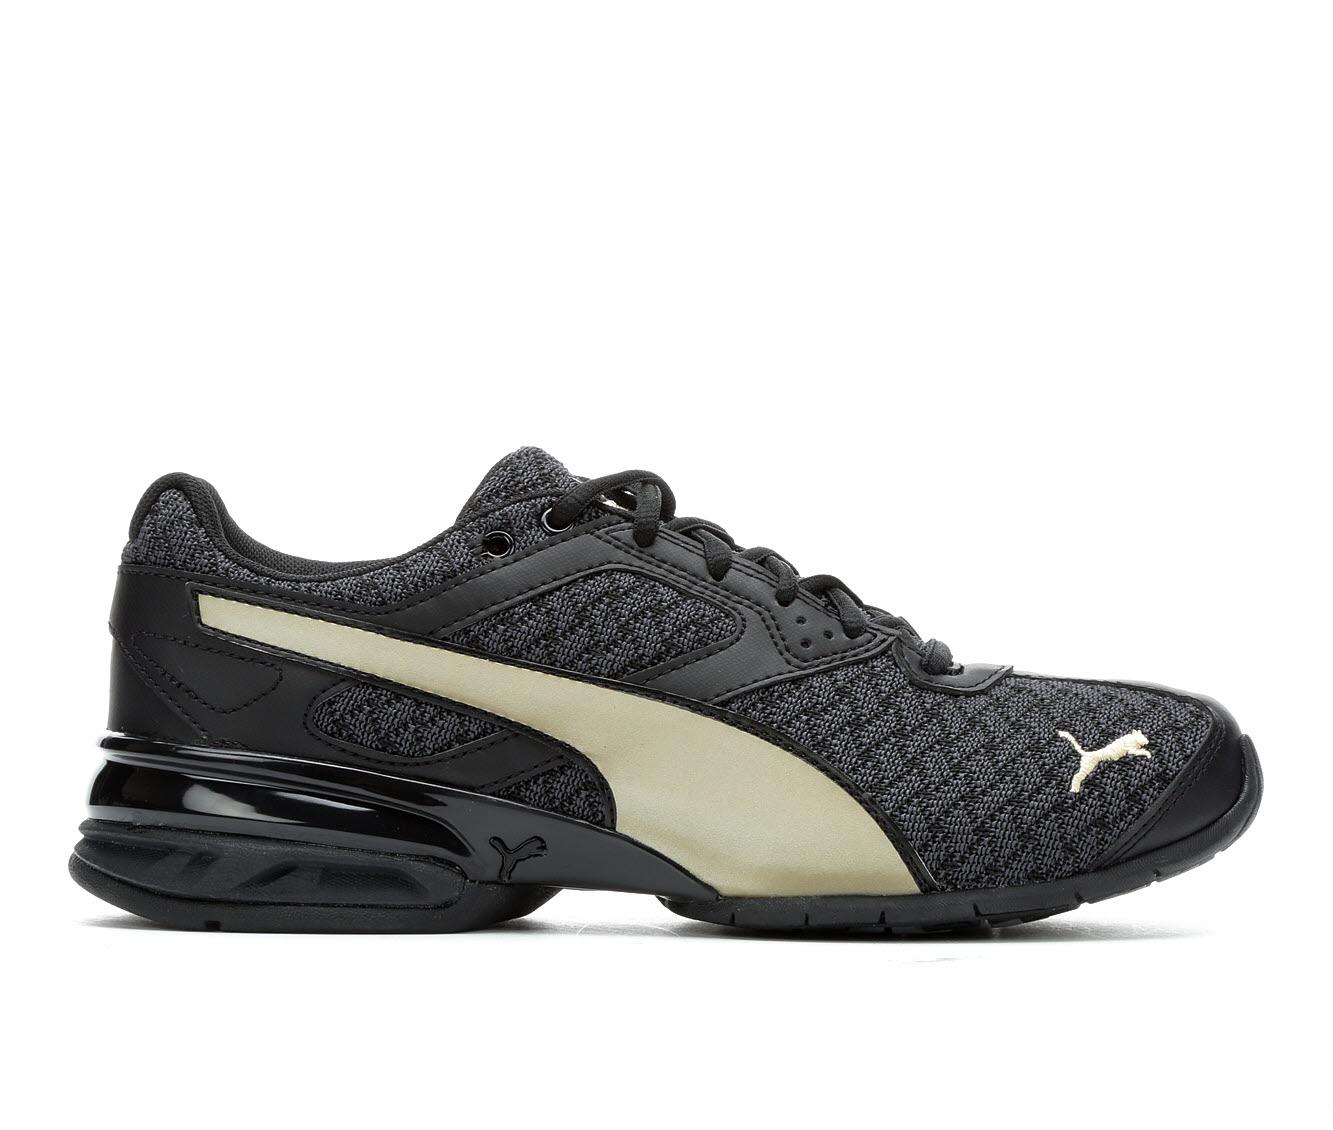 Puma Tazon 6 Luxe Women's Athletic Shoe (Black)